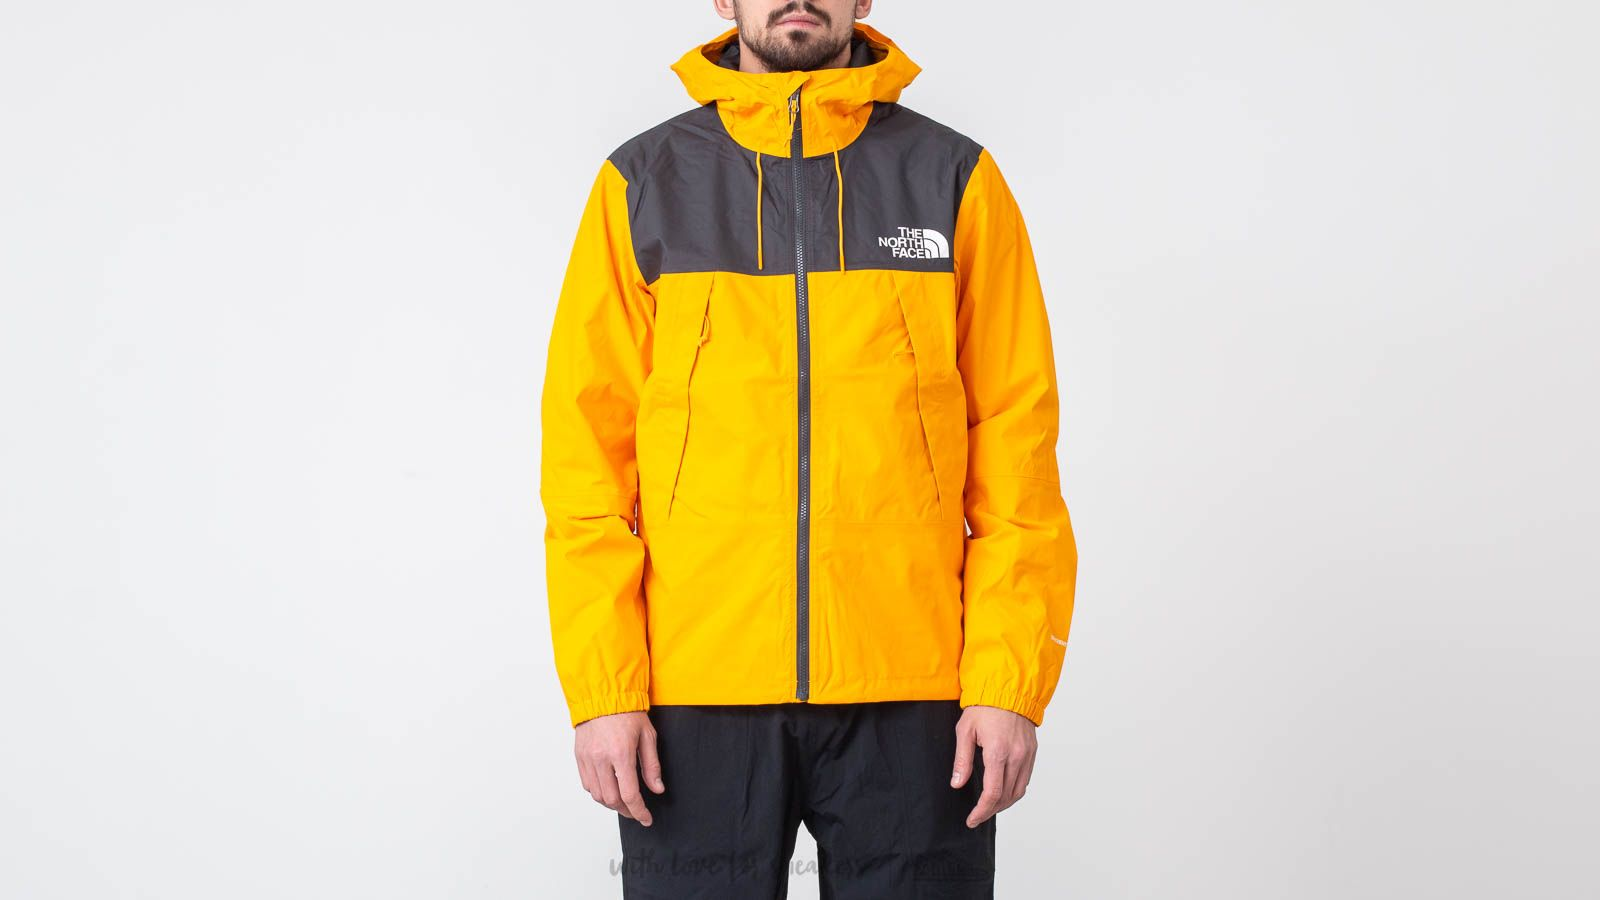 936062e4b5 The North Face 1990 Mountain Q Jacket Zinnia Orange   Footshop